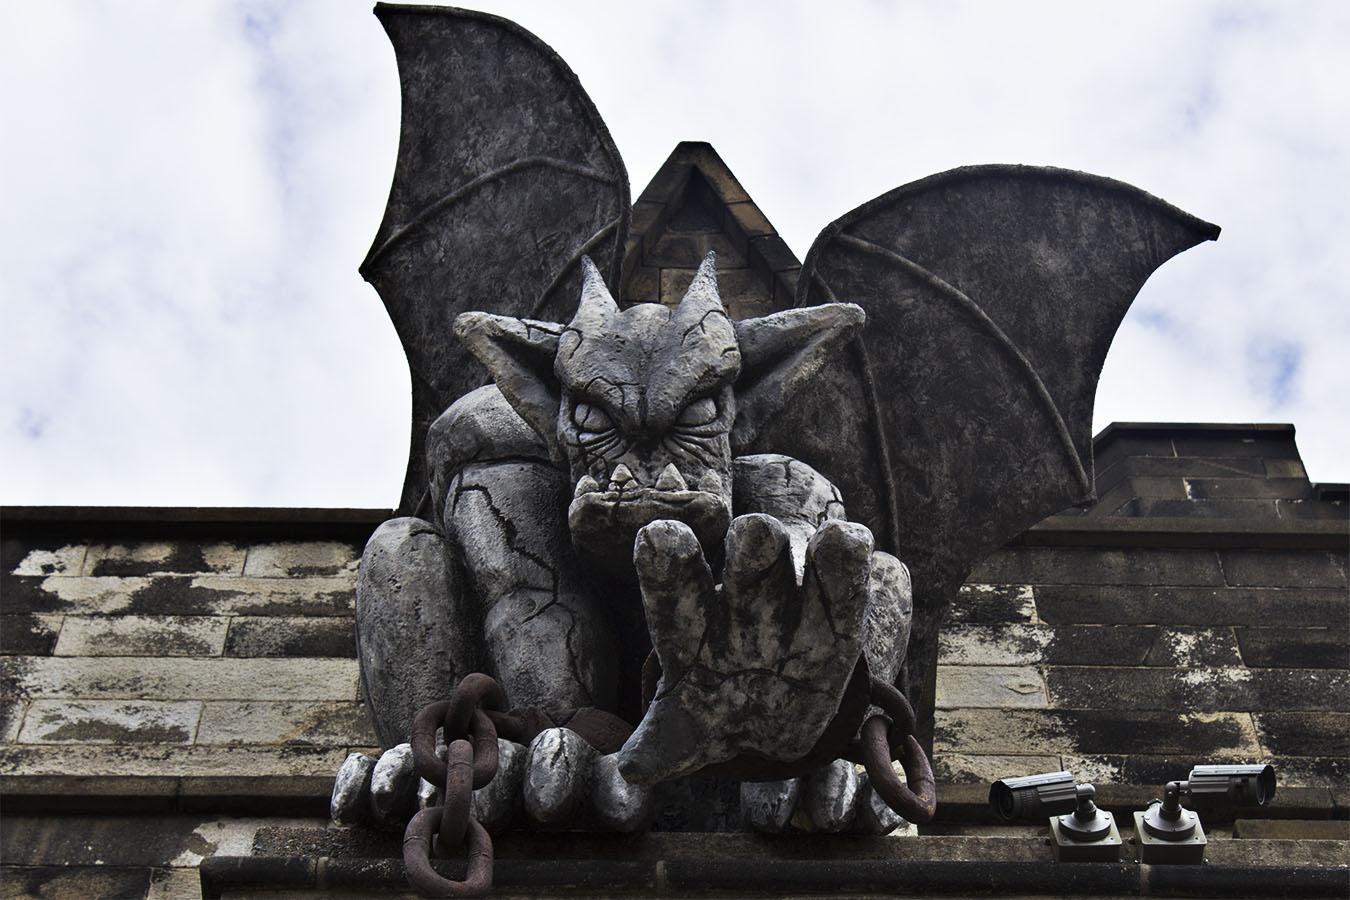 brian_schoenauer_photography_eastern_state_penitentiary_gargoyle_gothic_hand_chains